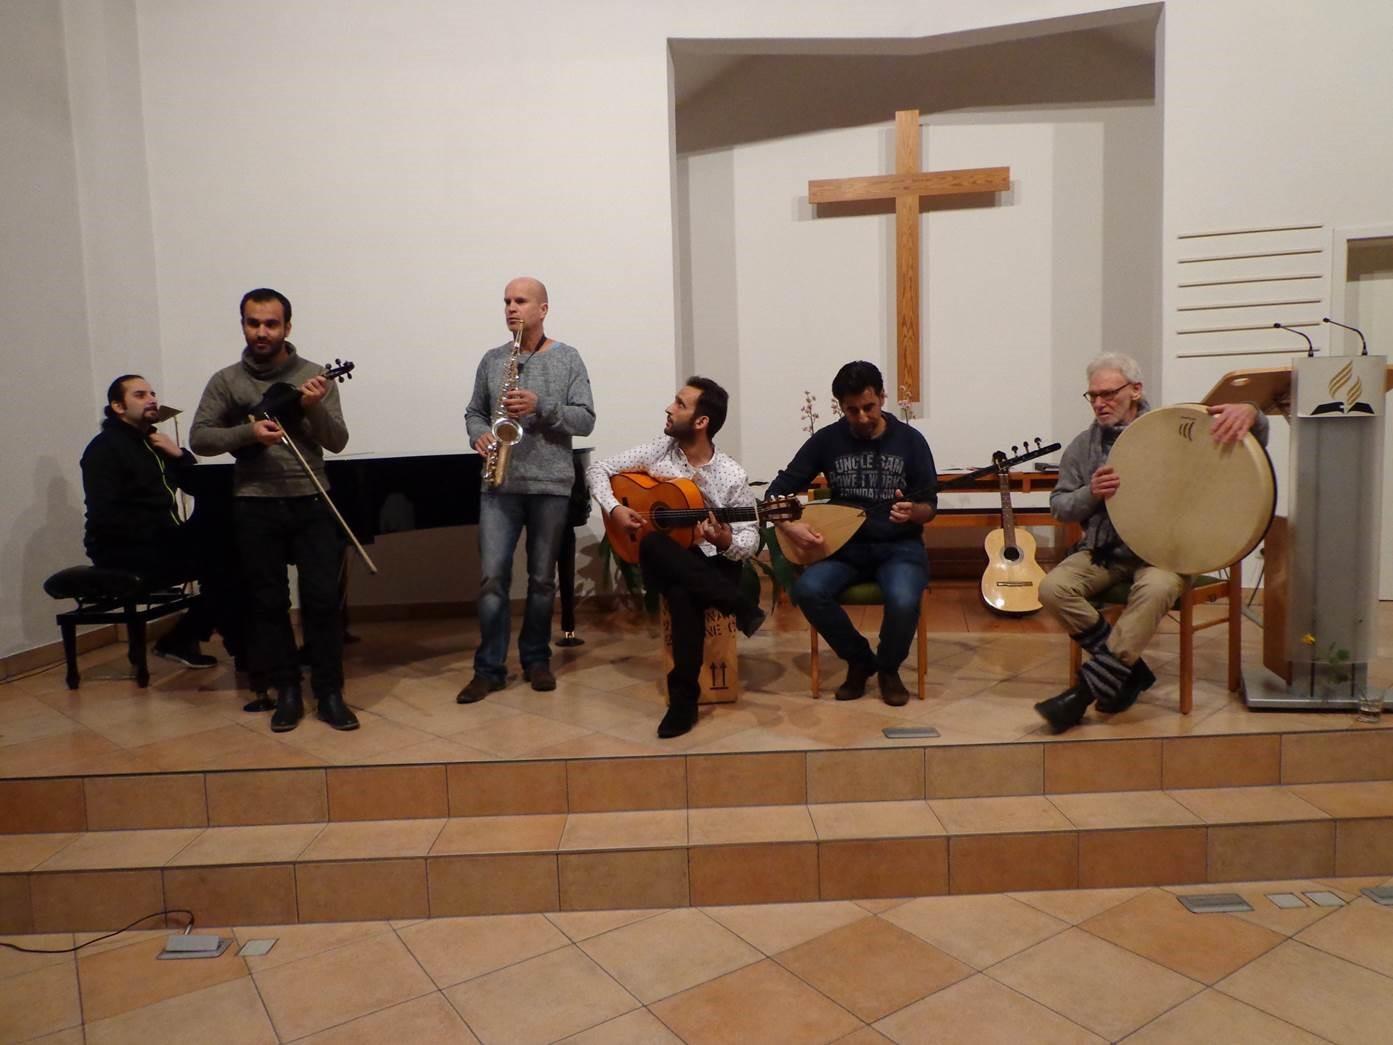 Musik gegen Rassismus in Lüneburg